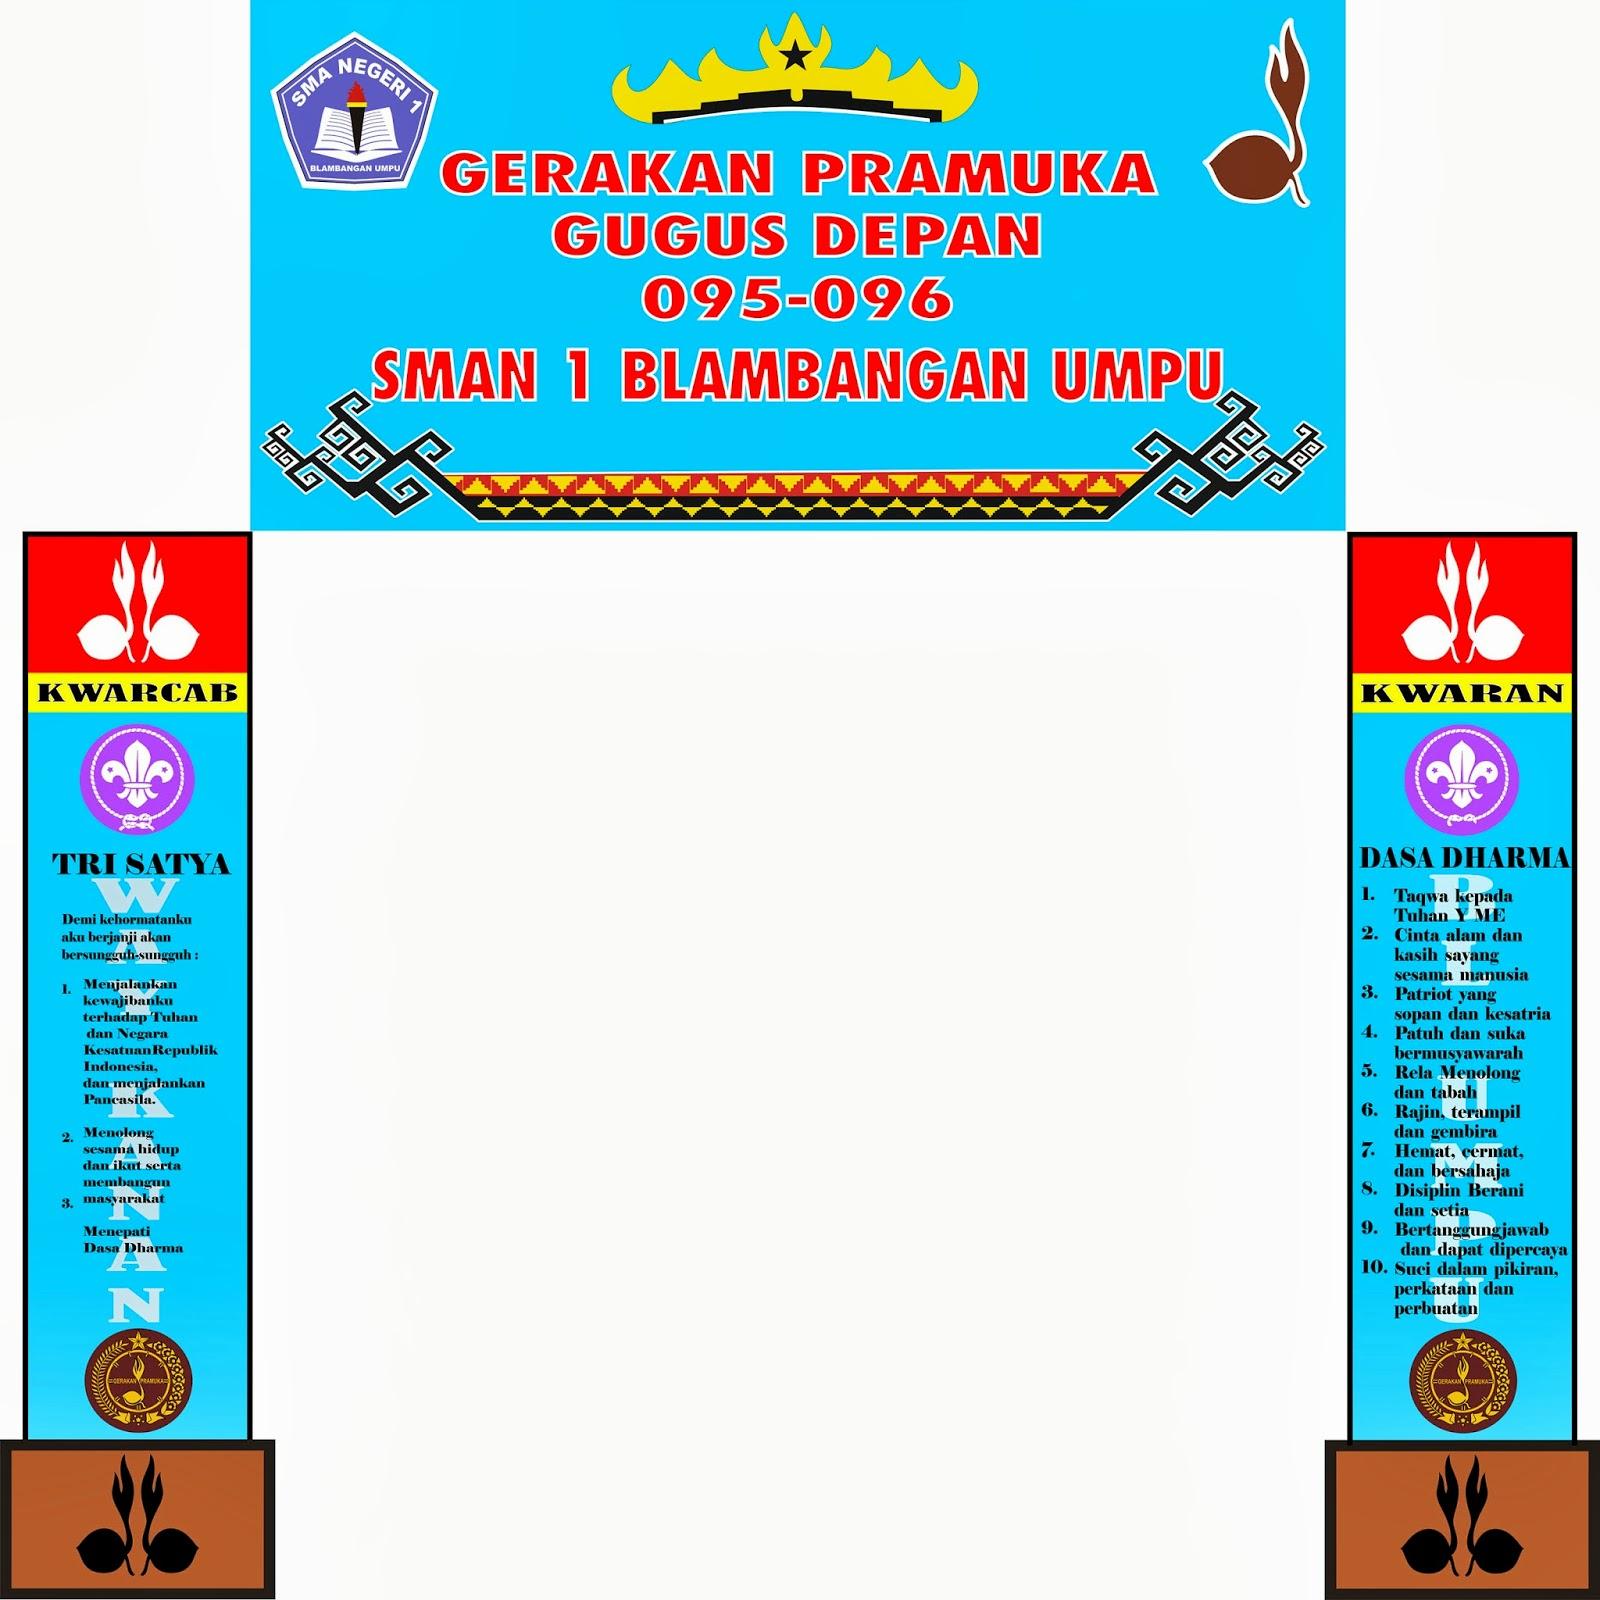 contoh gambar gapura james horner unofficial